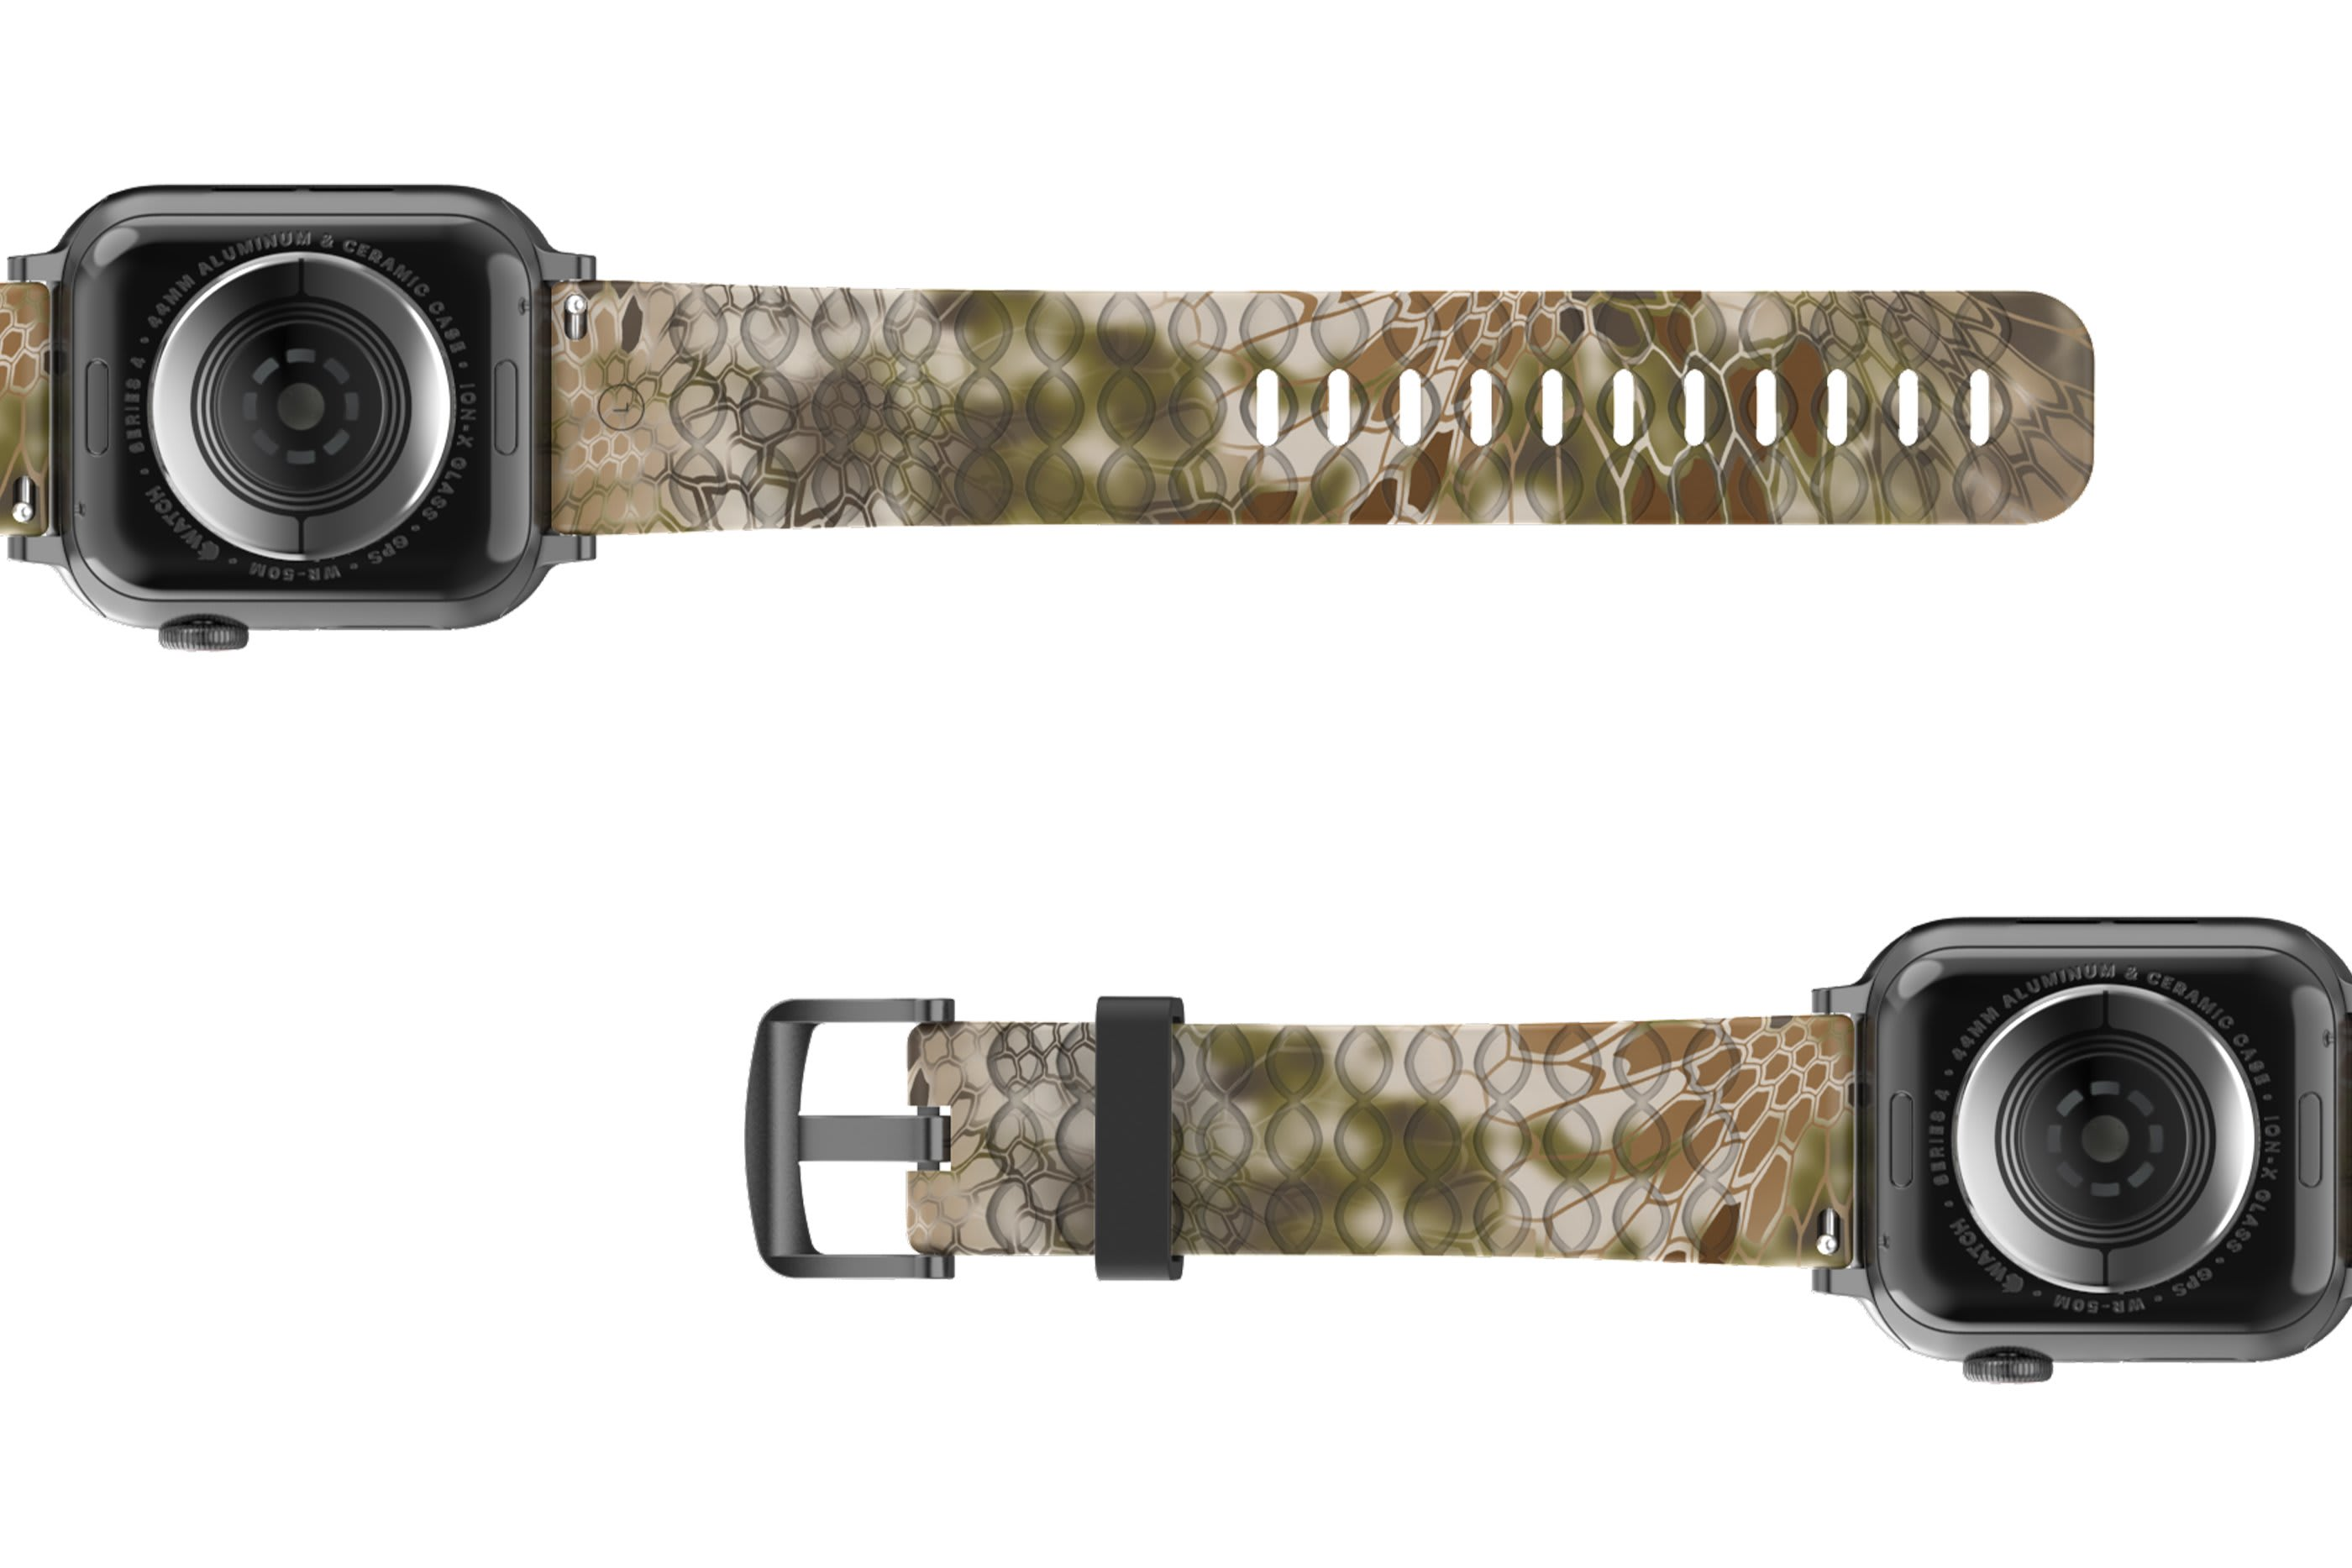 Kryptek Highlander  Apple Watch Band with gray hardware viewed bottom up